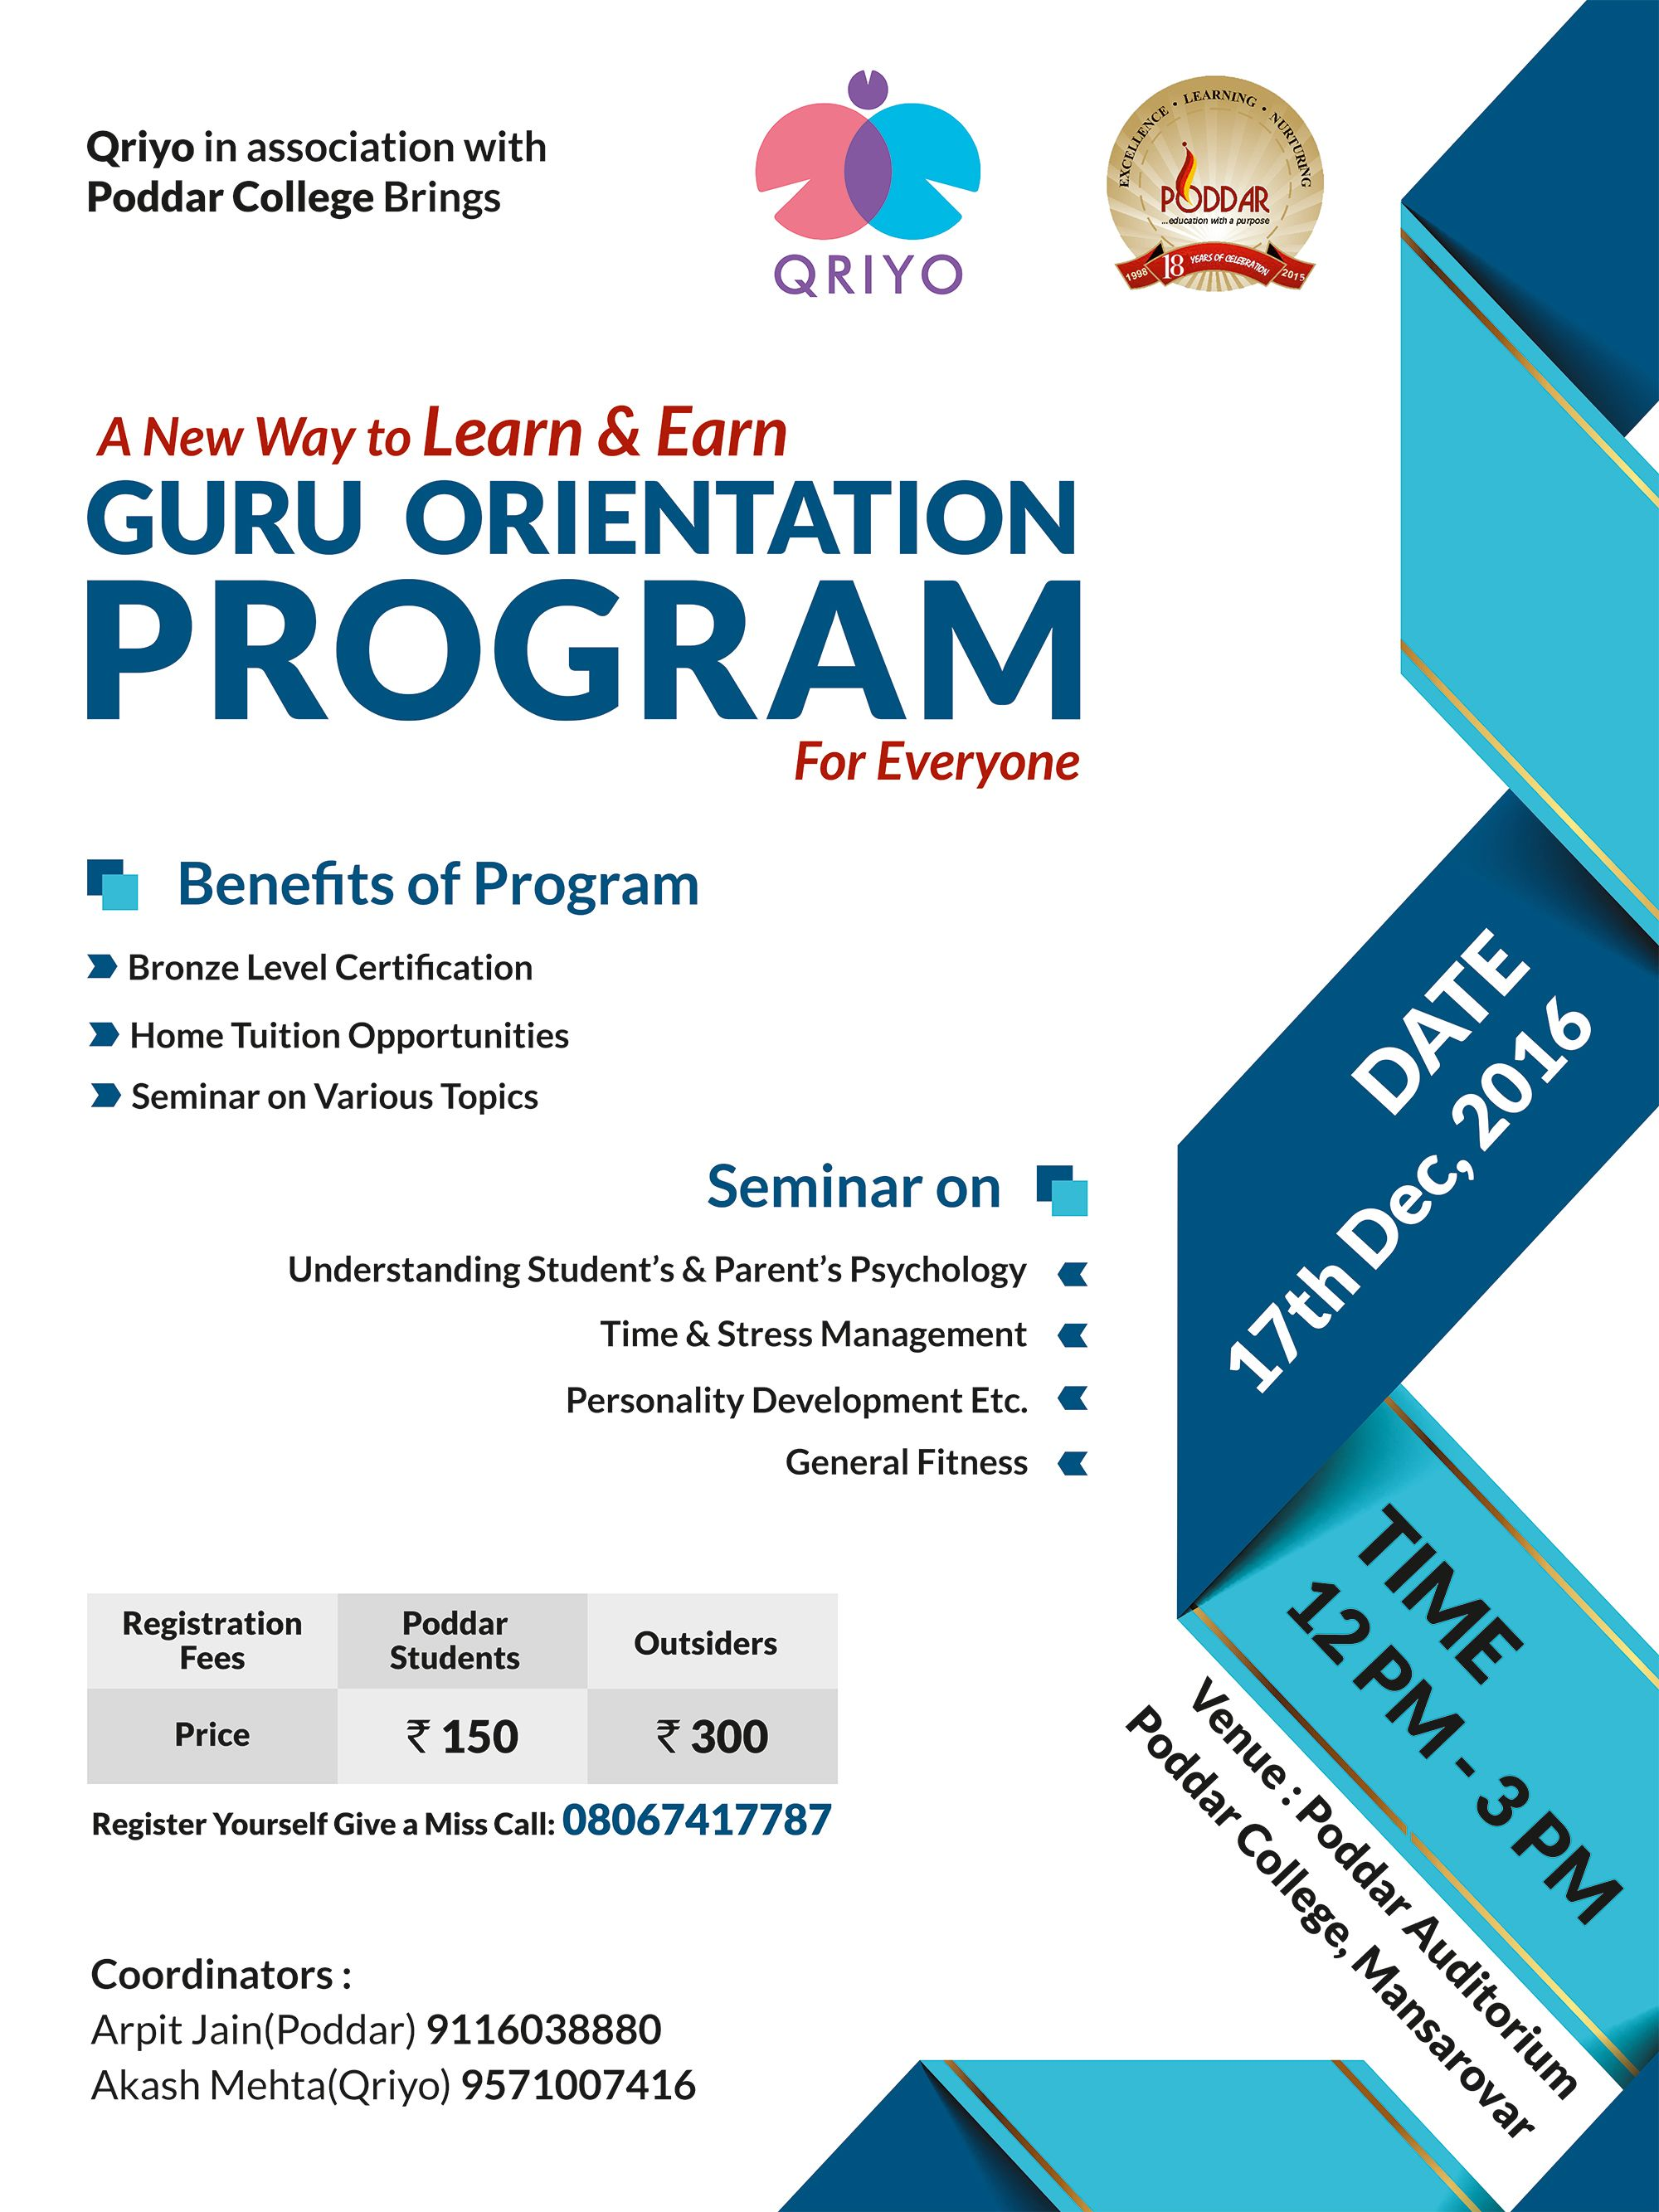 purpose of orientation program